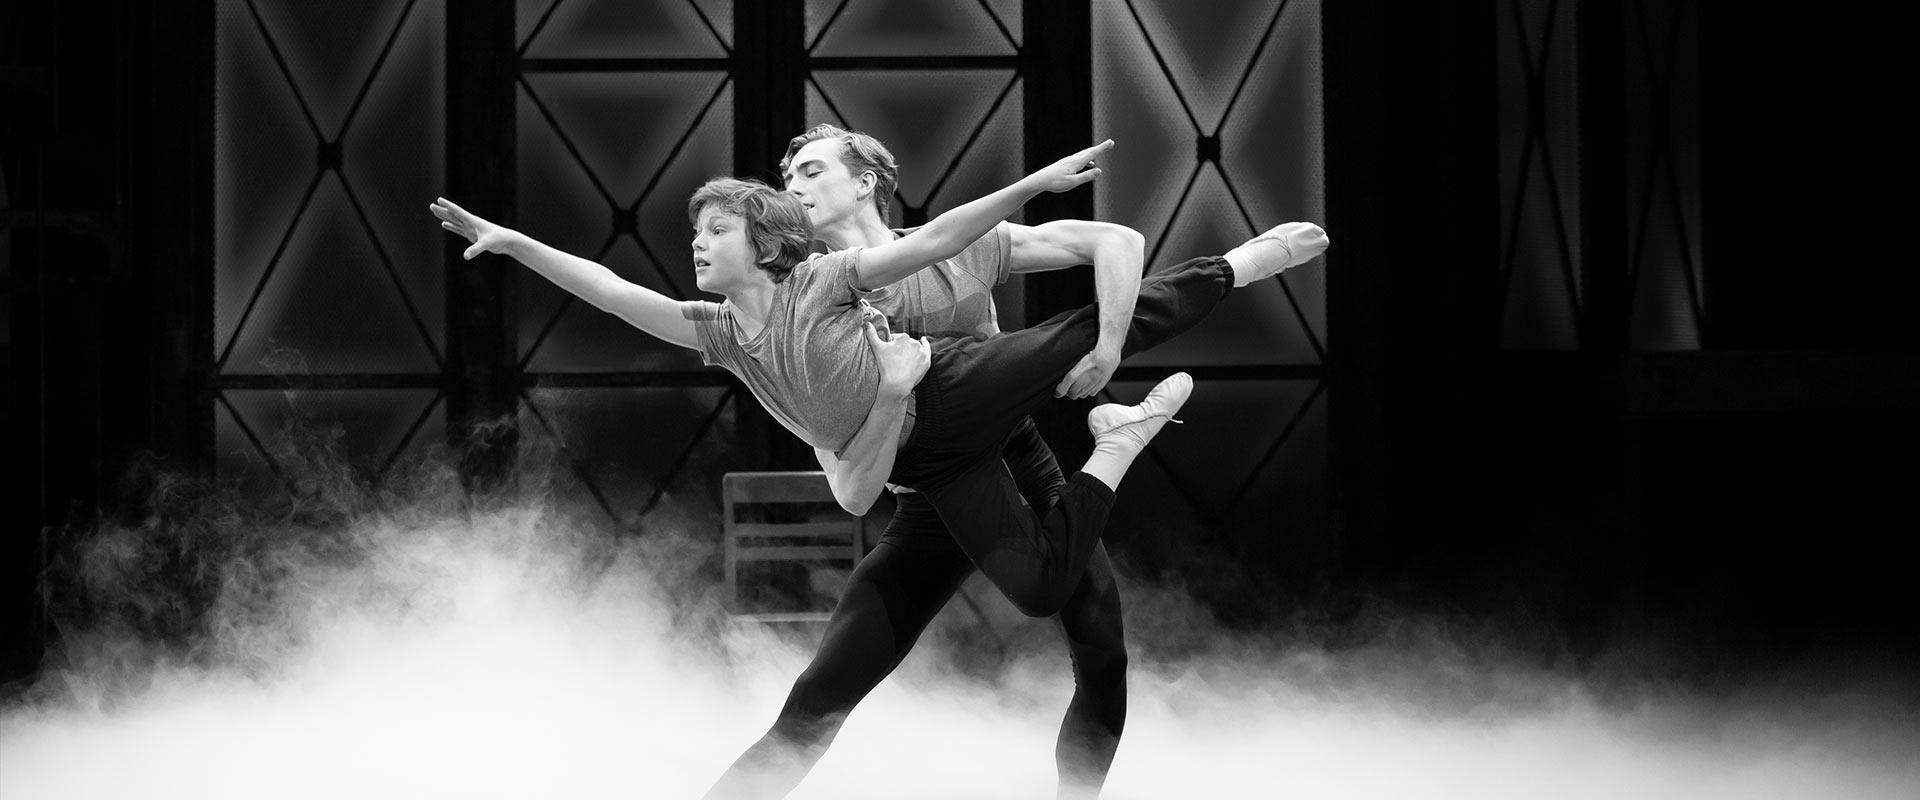 Archival photograph of a ballet dancer